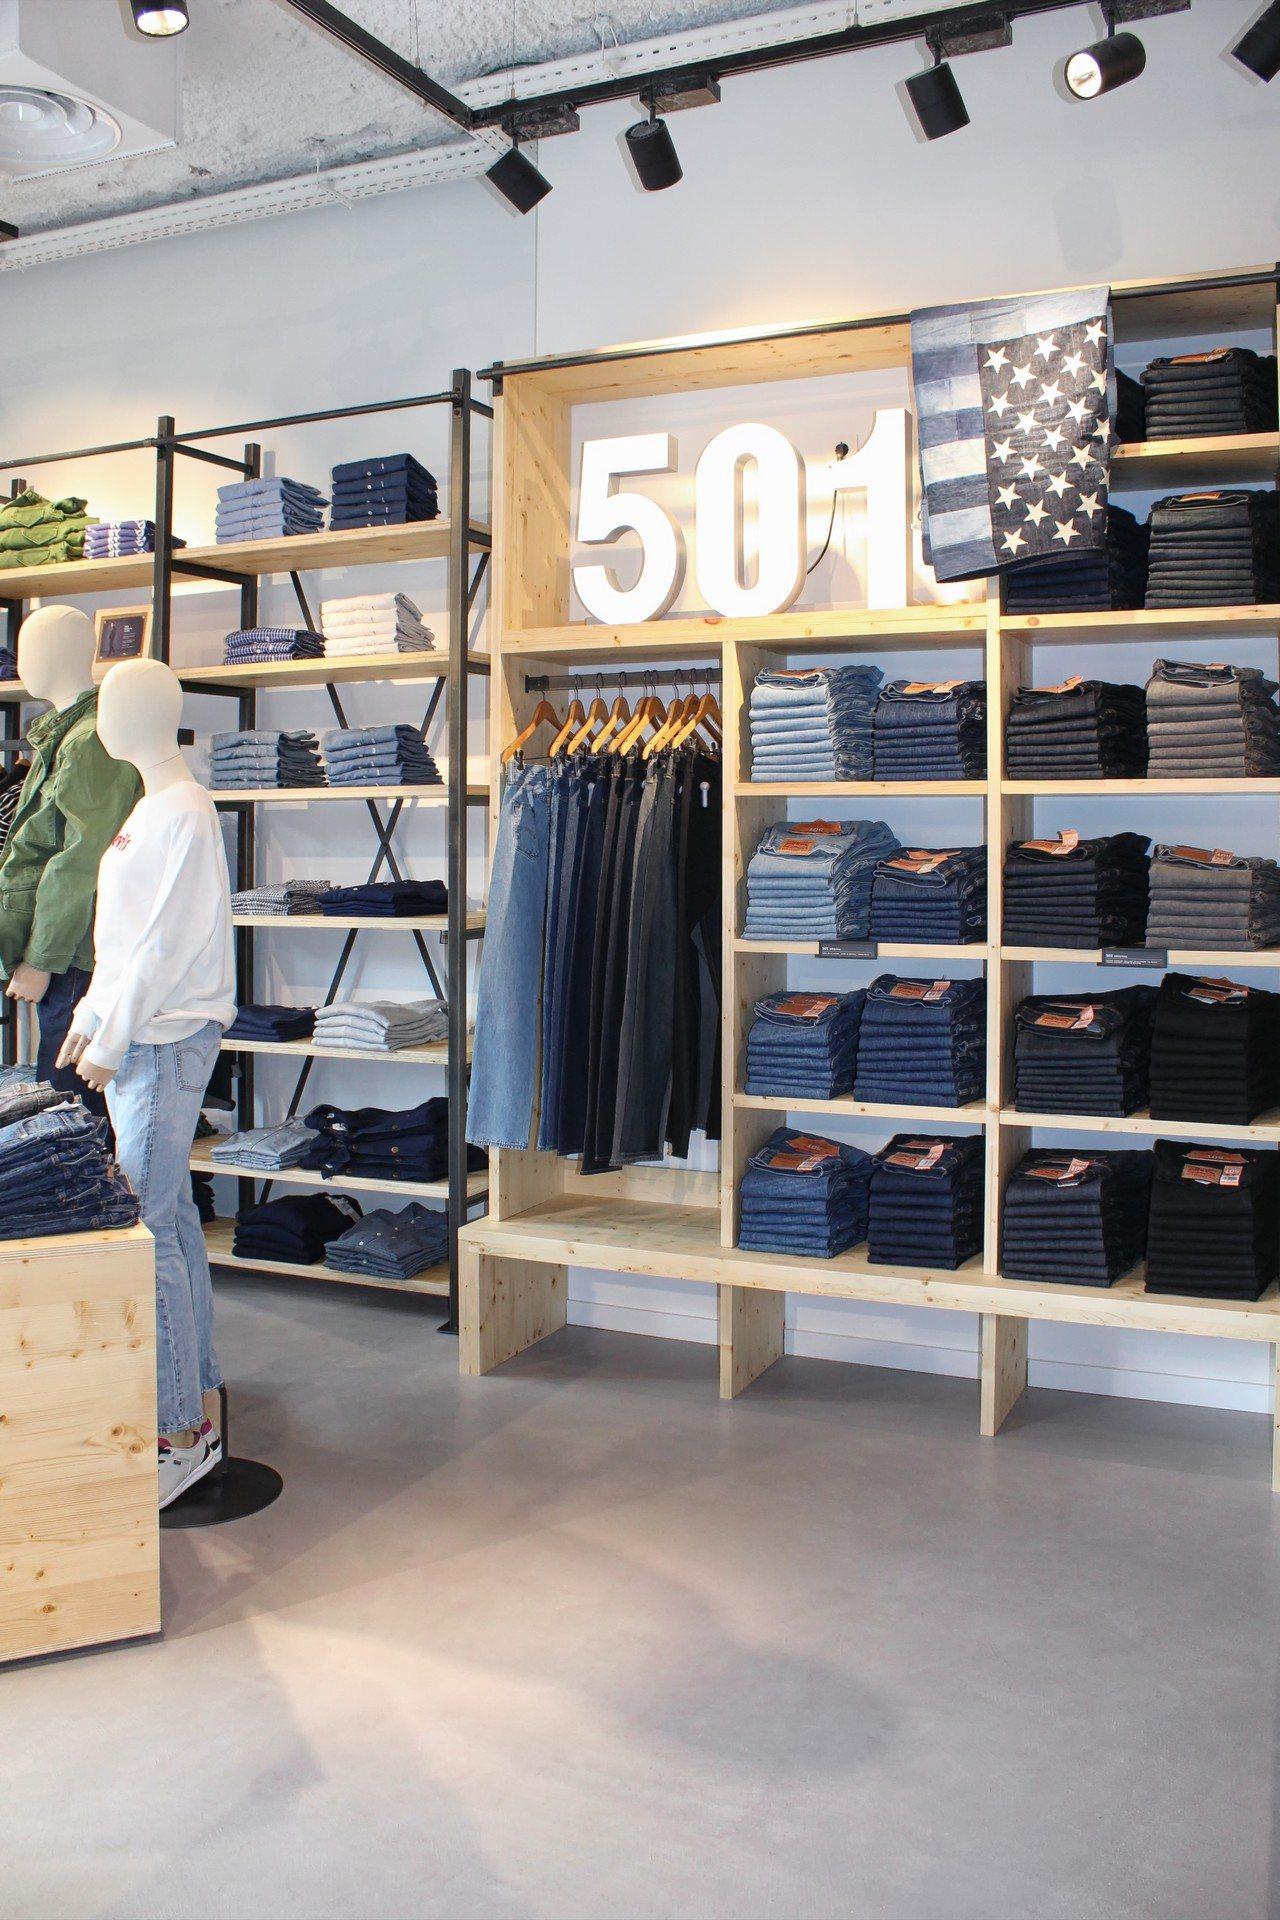 Microcemento de Tecnocemento en tiendas de ropa